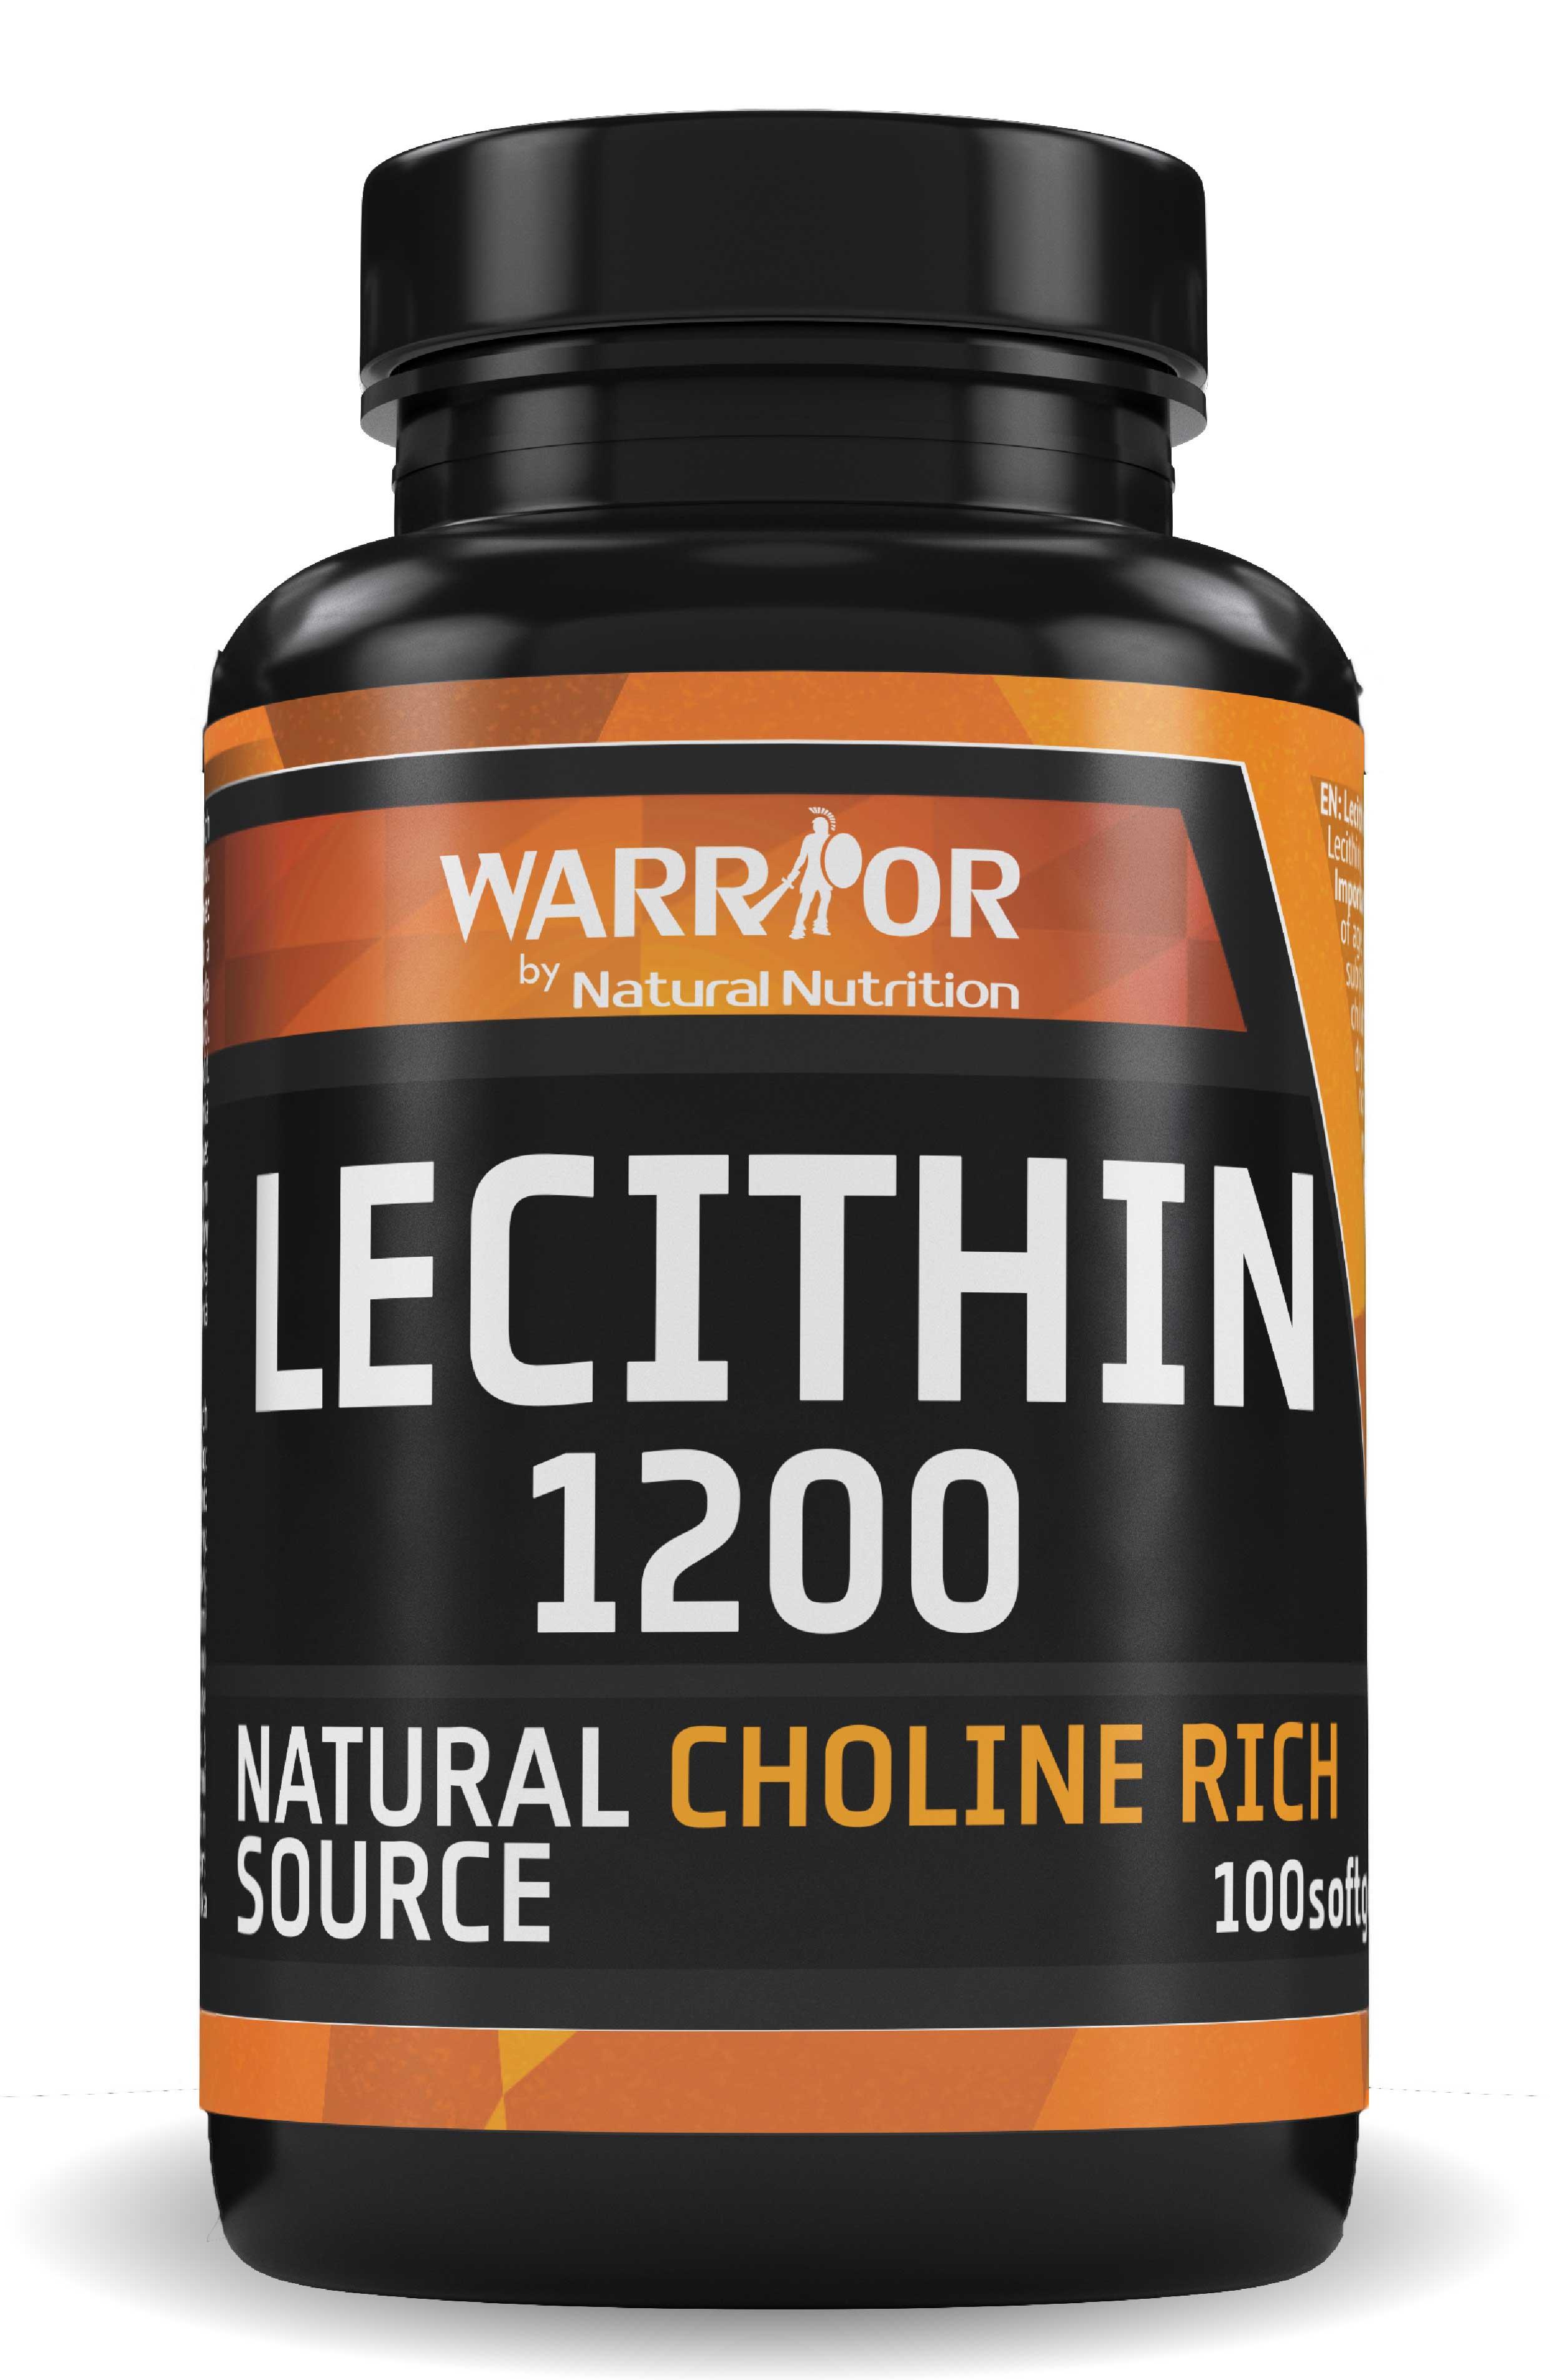 Lecithin 1200 Softgels 100 Softgels